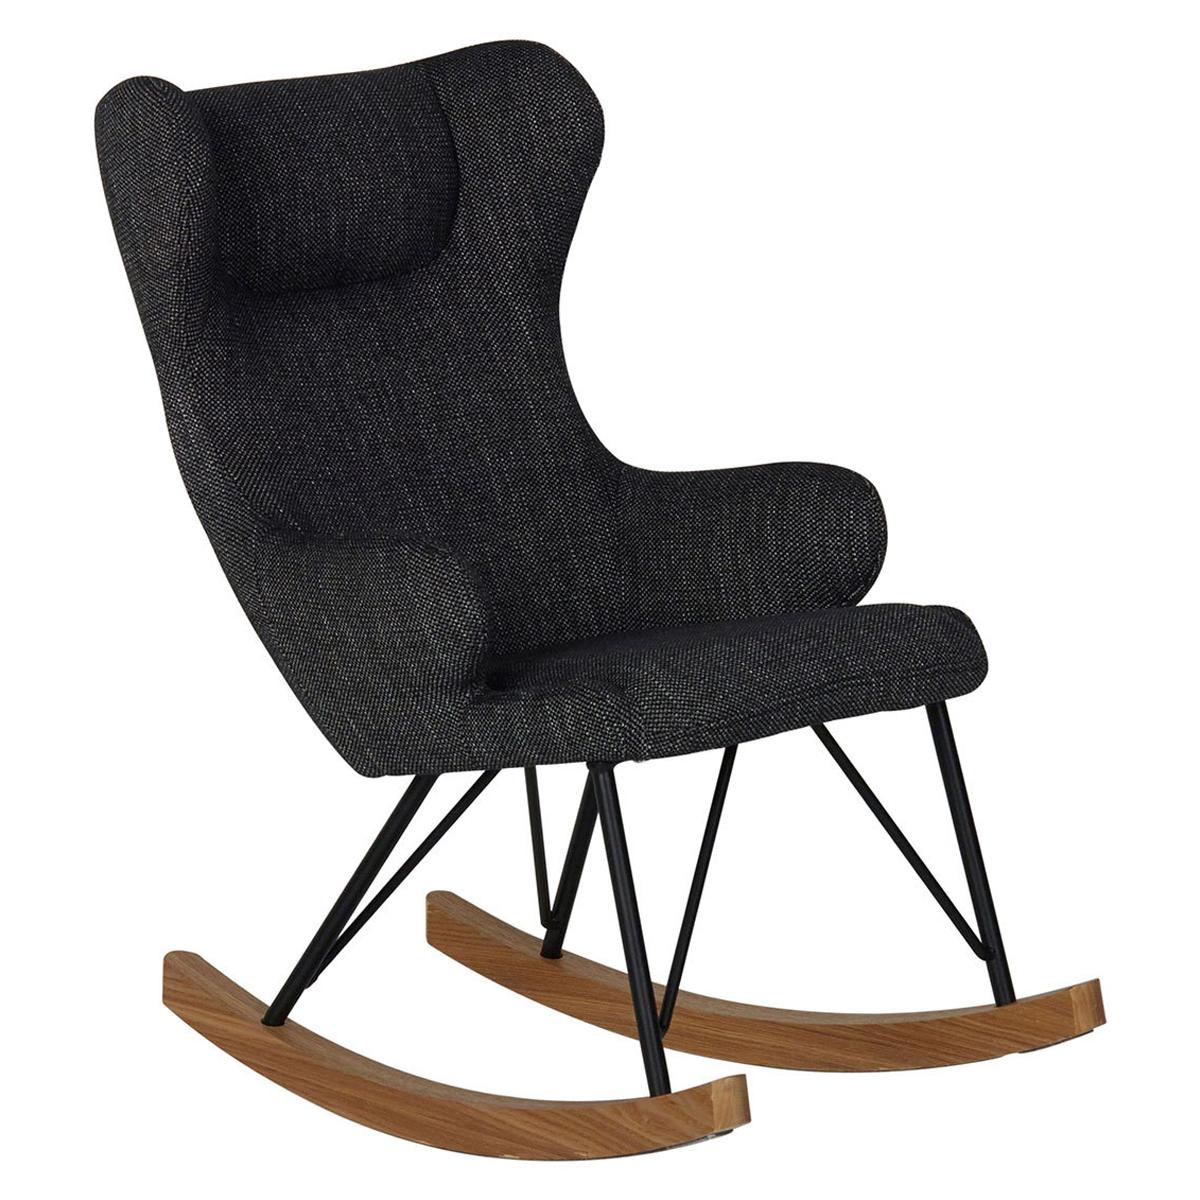 Fauteuil Rocking Kids Chair De Luxe - Black Rocking Kids Chair De Luxe - Black